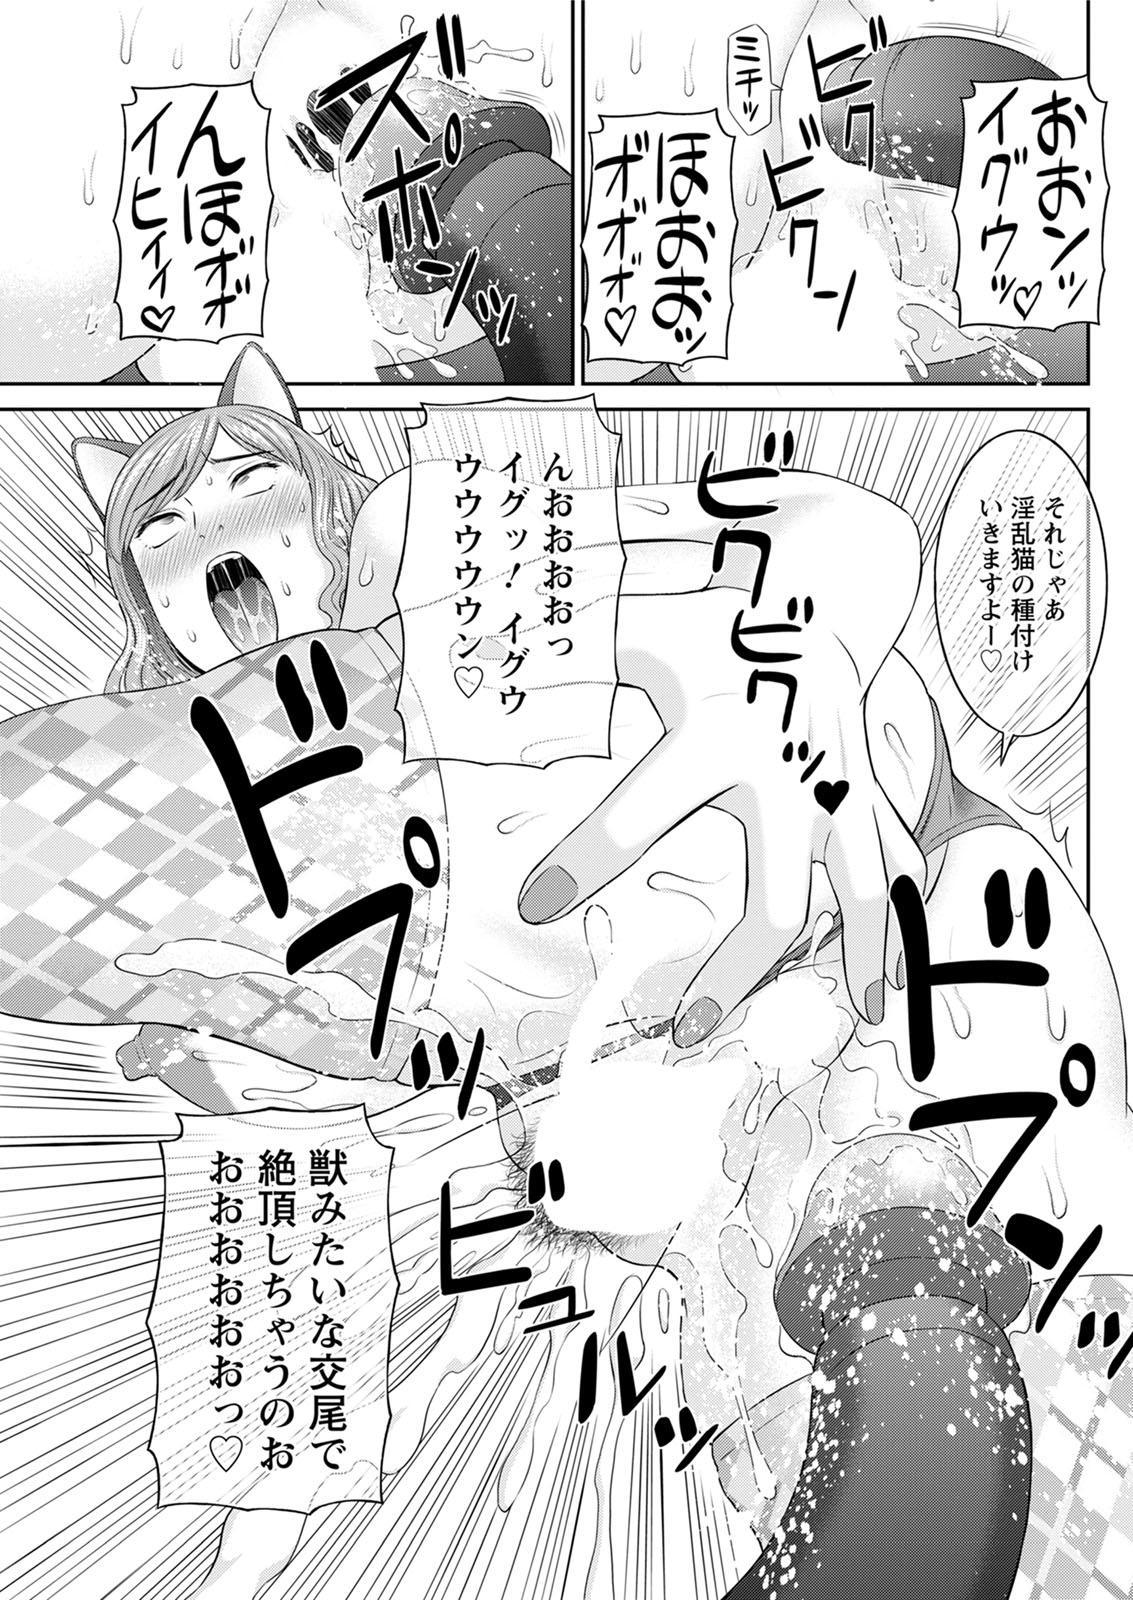 [Kawamori Misaki] Kaikan Hitotsuma Gakuen Ch. 1-6, 8-20 [Digital] 255